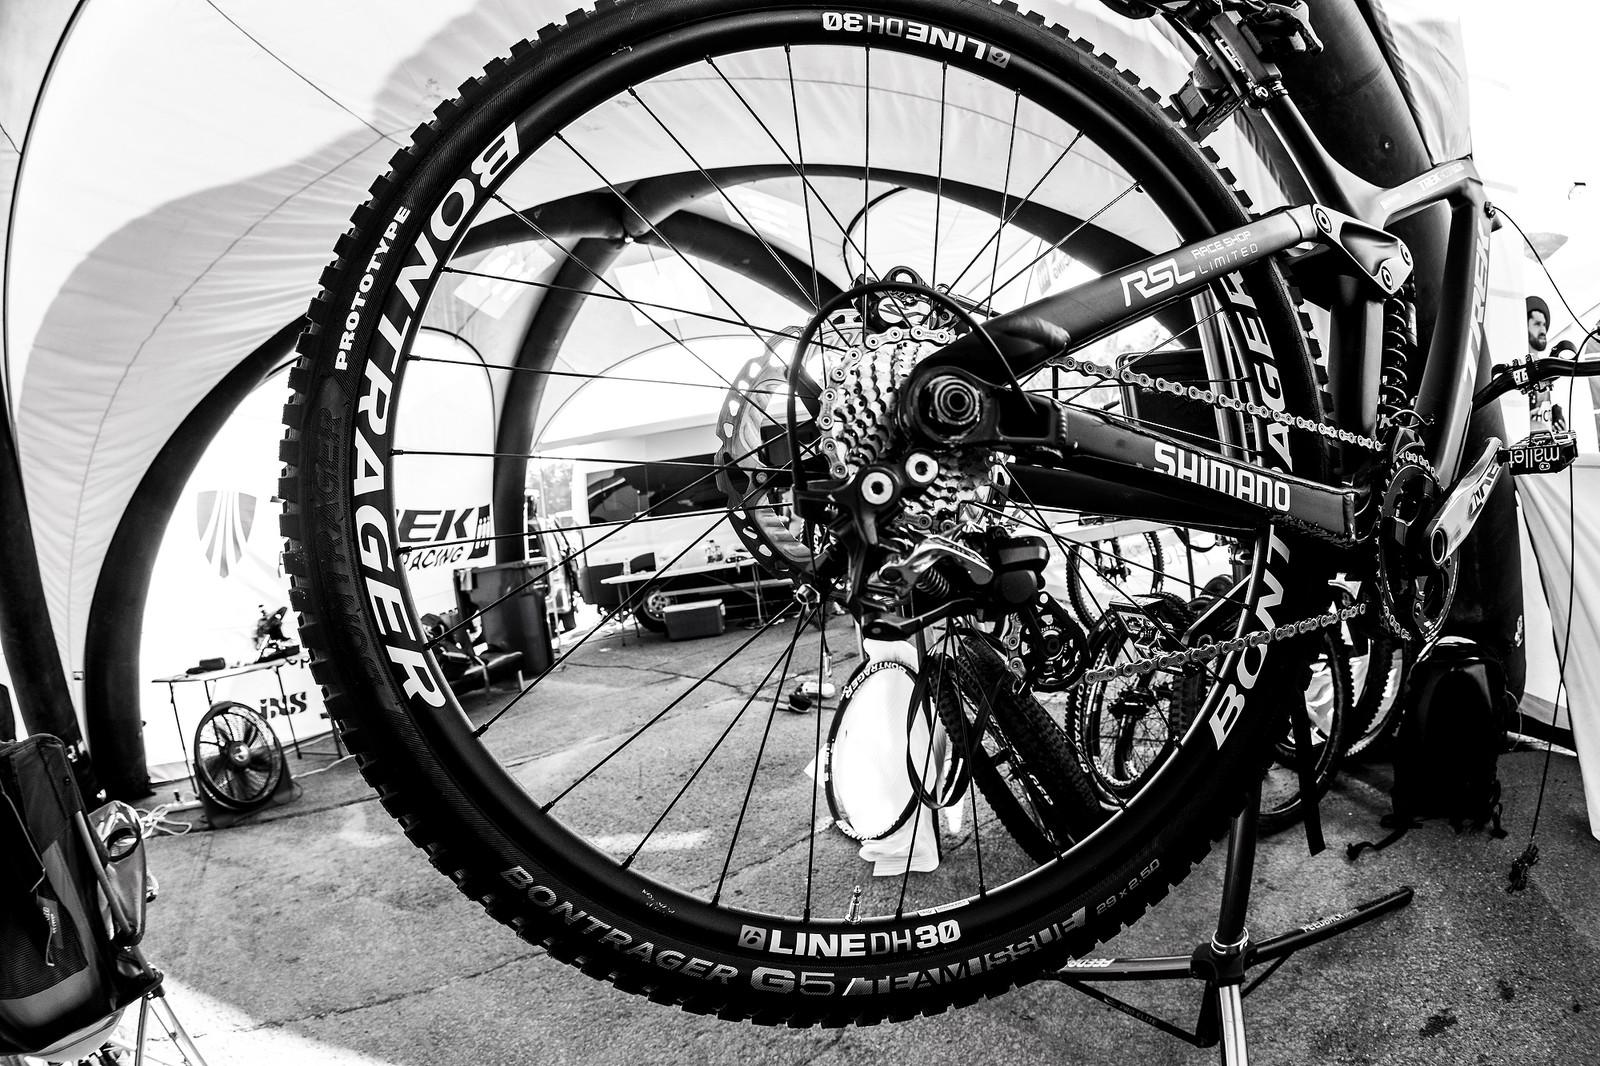 New Bontrager G5 29 x 2.5 DH Tire - PIT BITS - Mont-Sainte-Anne World Cup - Mountain Biking Pictures - Vital MTB